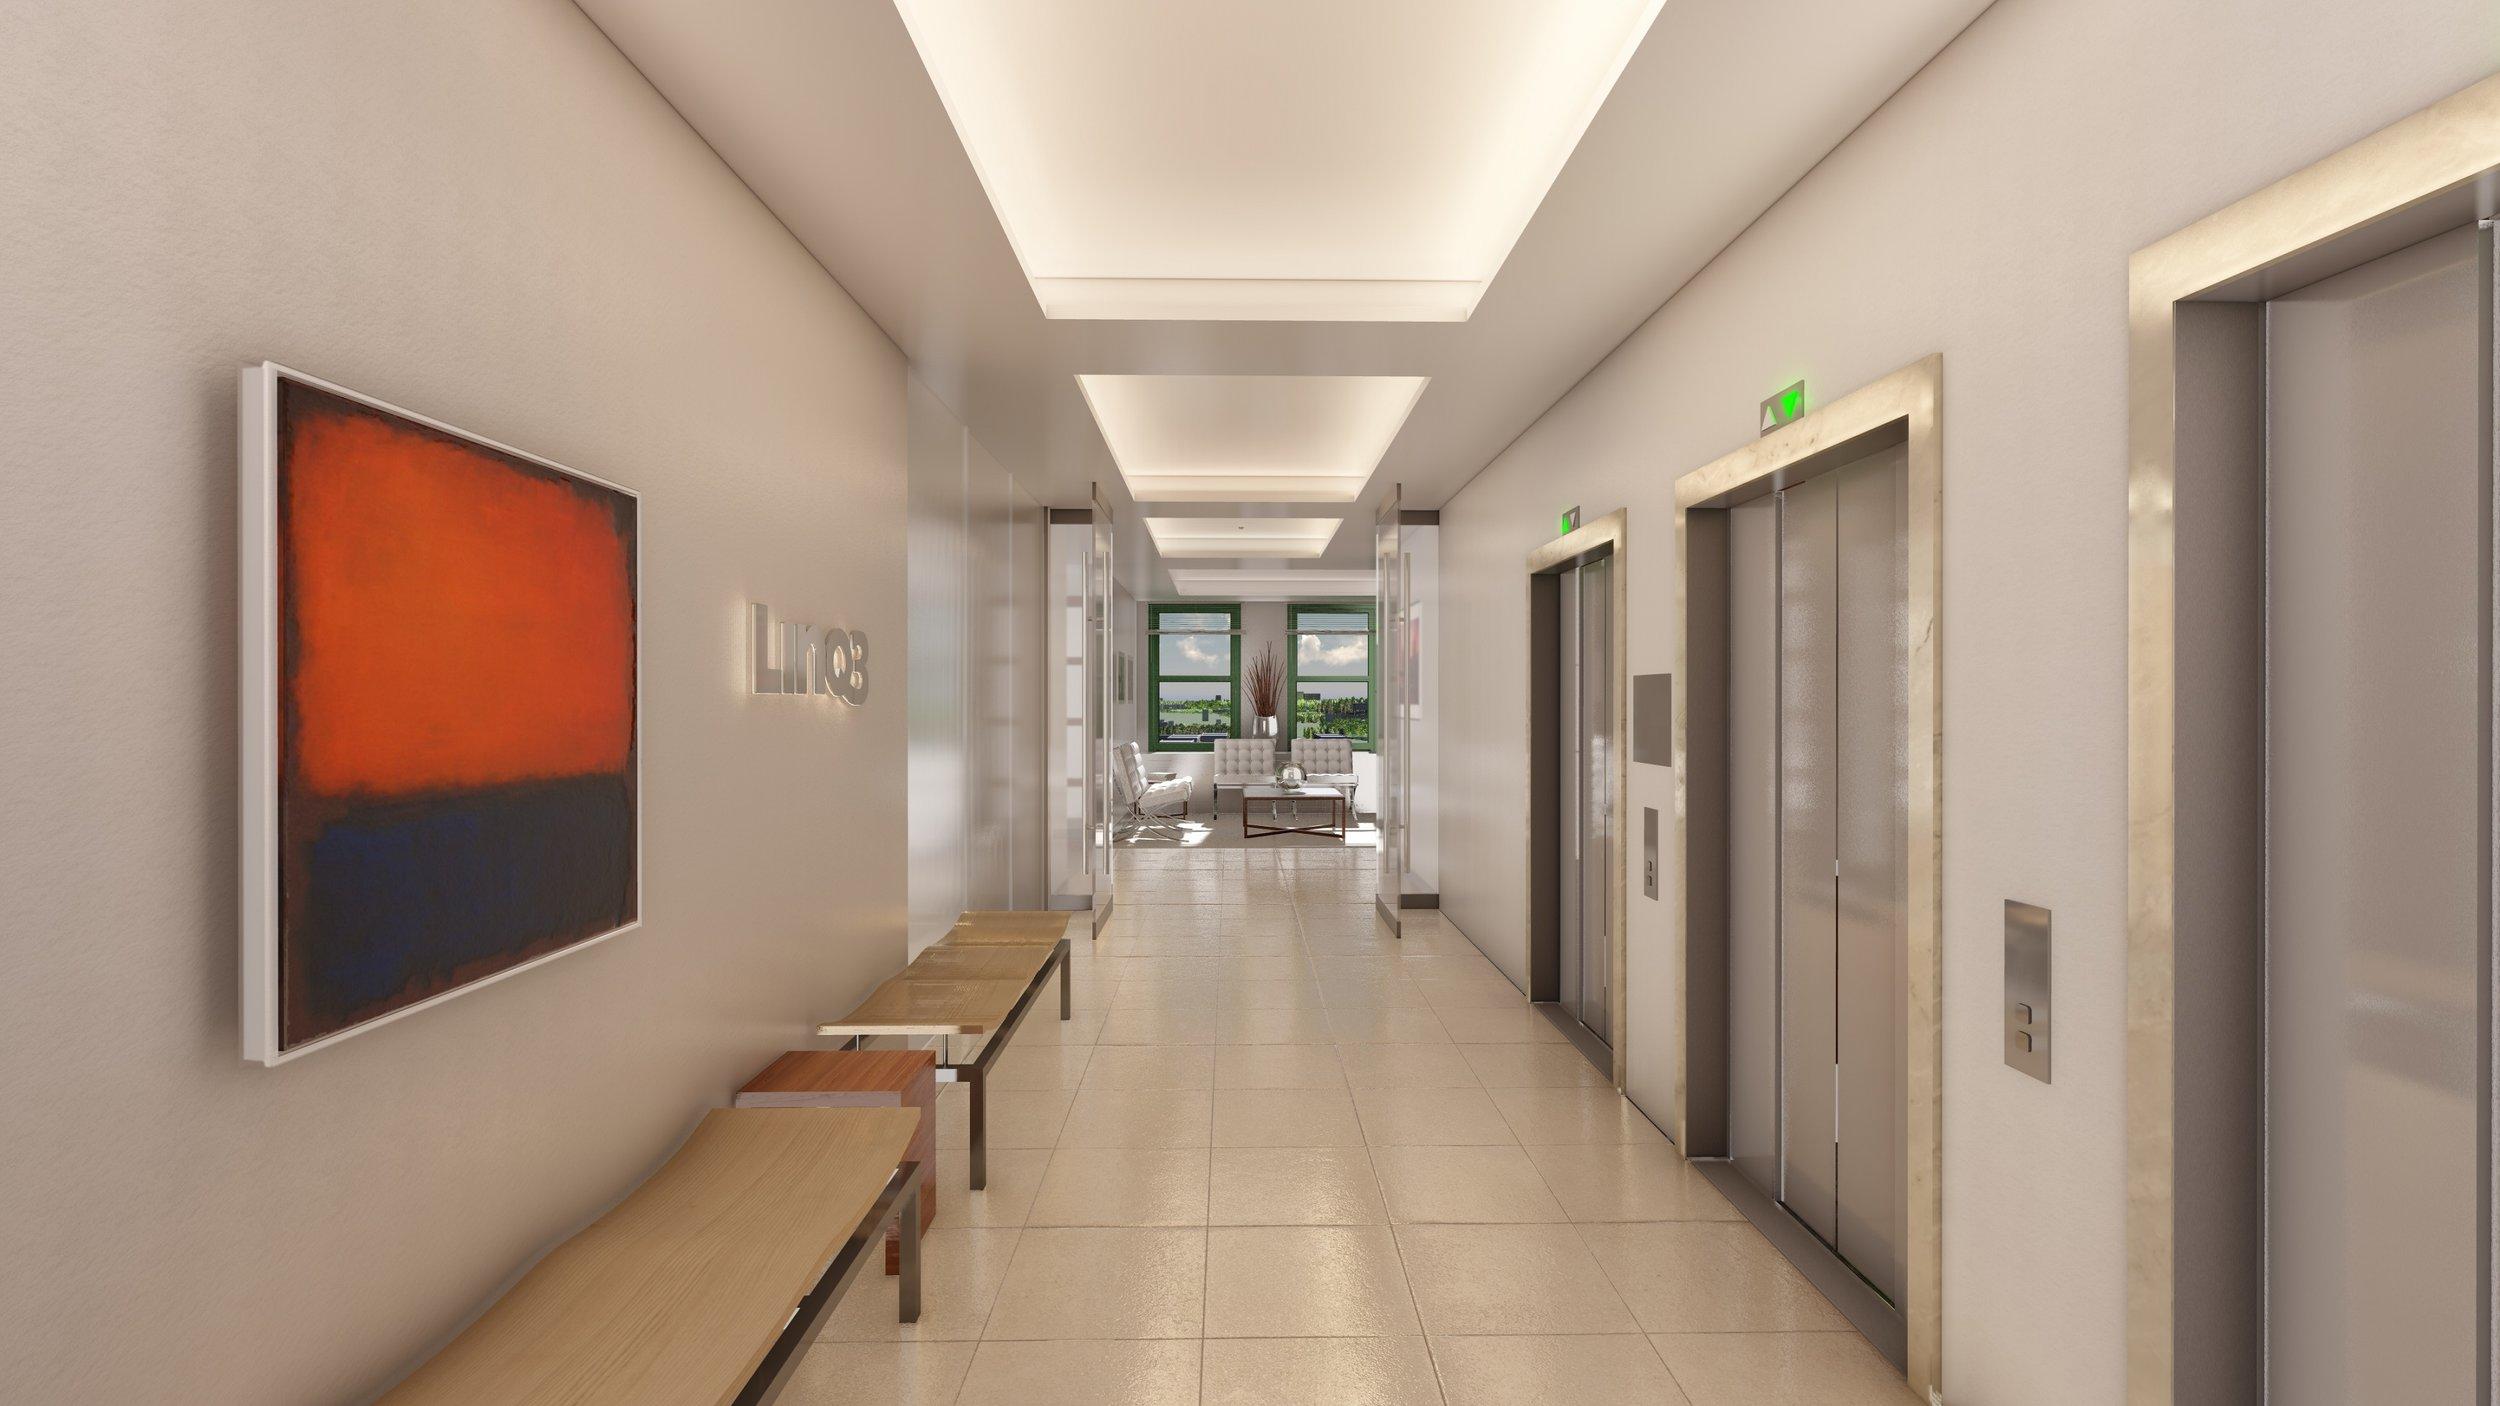 LINQ 3 Office